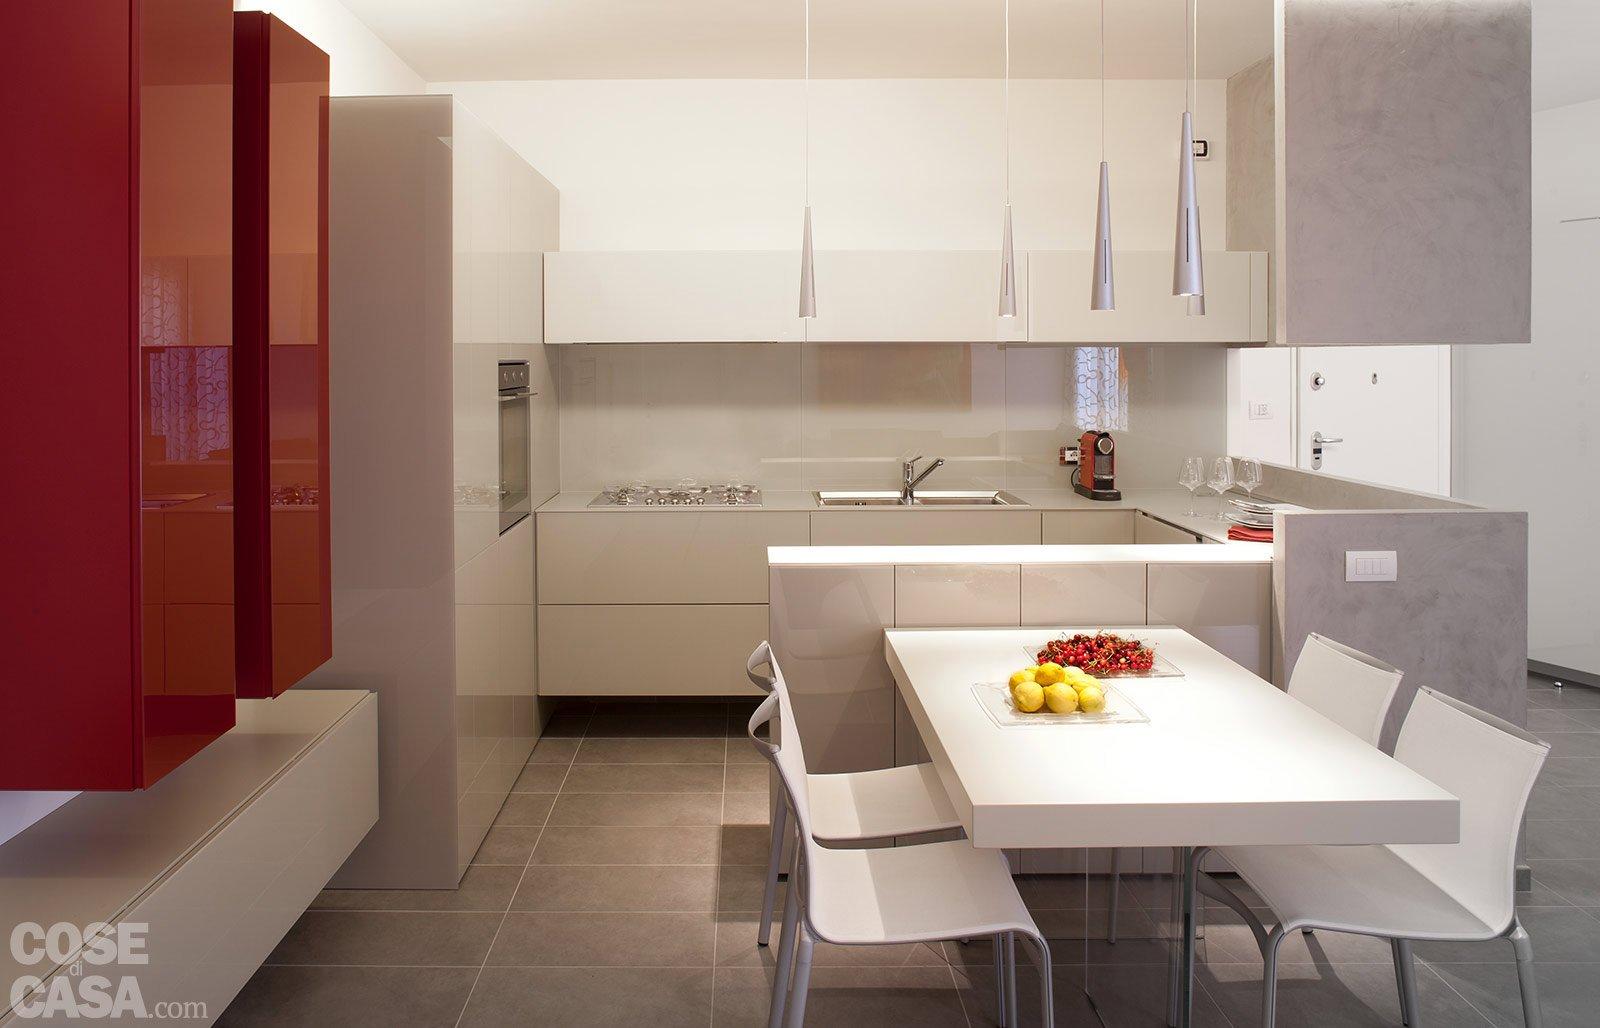 85 mq una casa per una famiglia giovane cose di casa - Cucina per casa ...